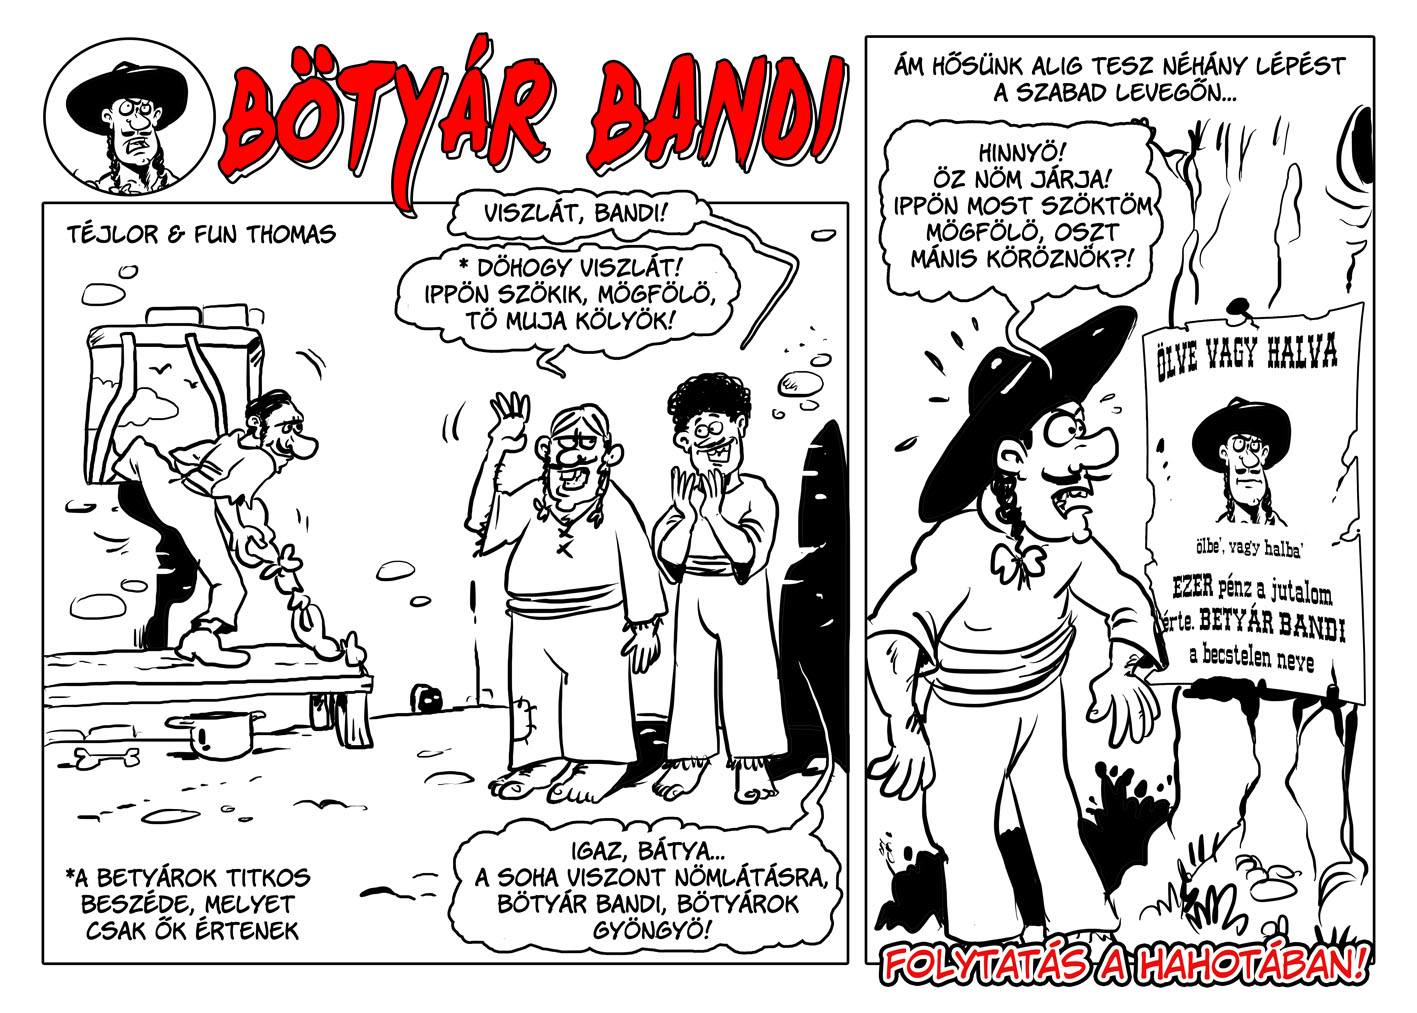 botyar_bandi_tejlor_hahota.jpg